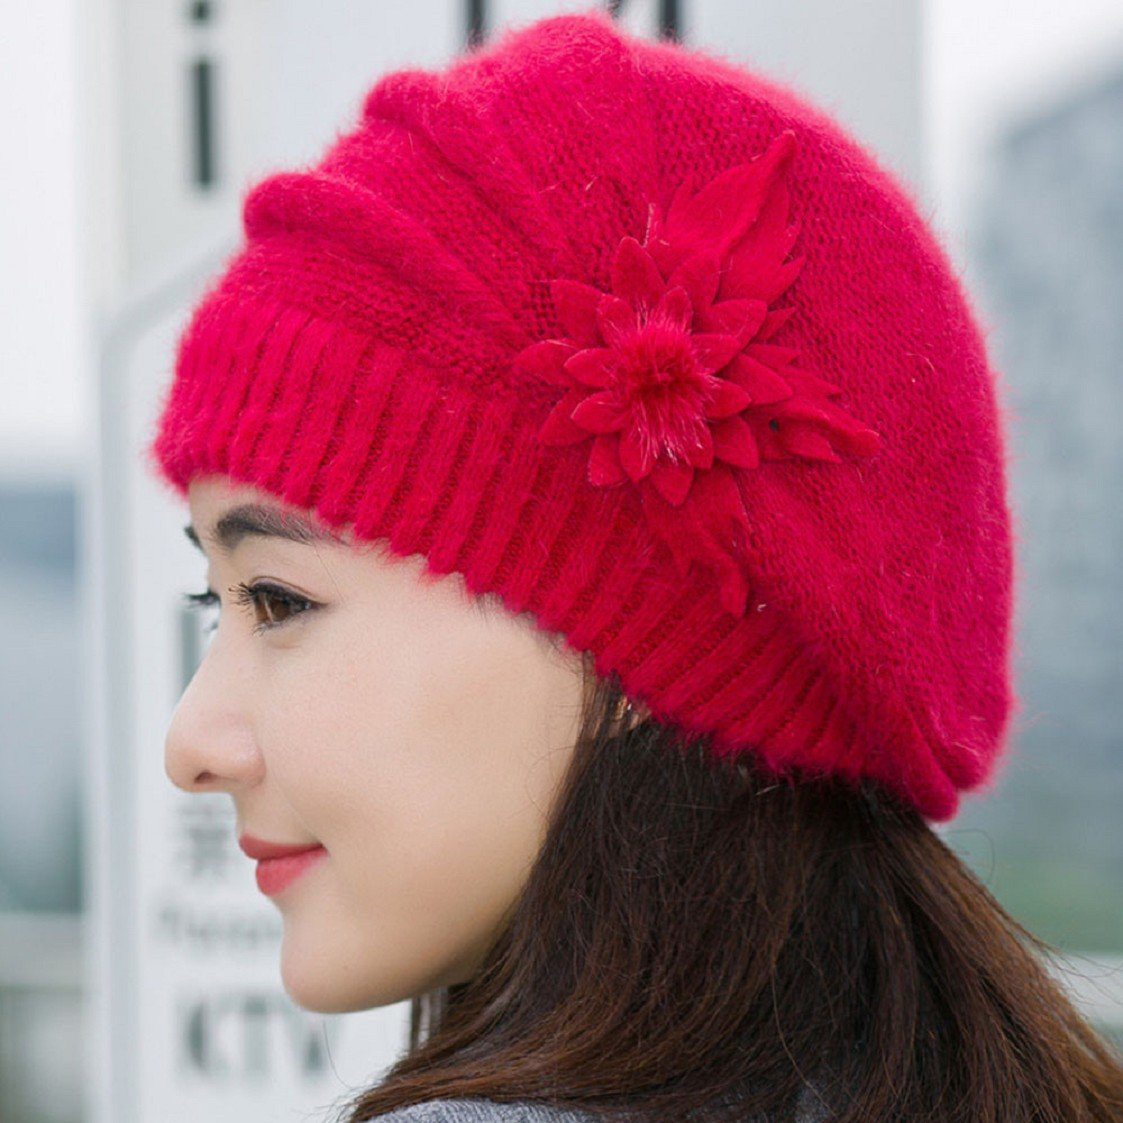 f052be54aa9 ... Femmes Fleur Tricot Crochet Beanie Hat Hiver Chaud Cap Beret Agrandir  l image